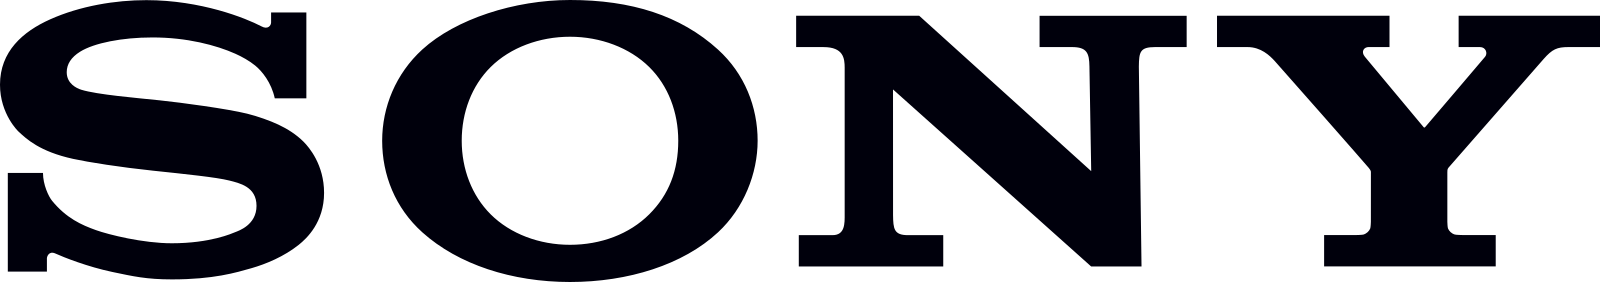 sony logo 2 - Sony Logo